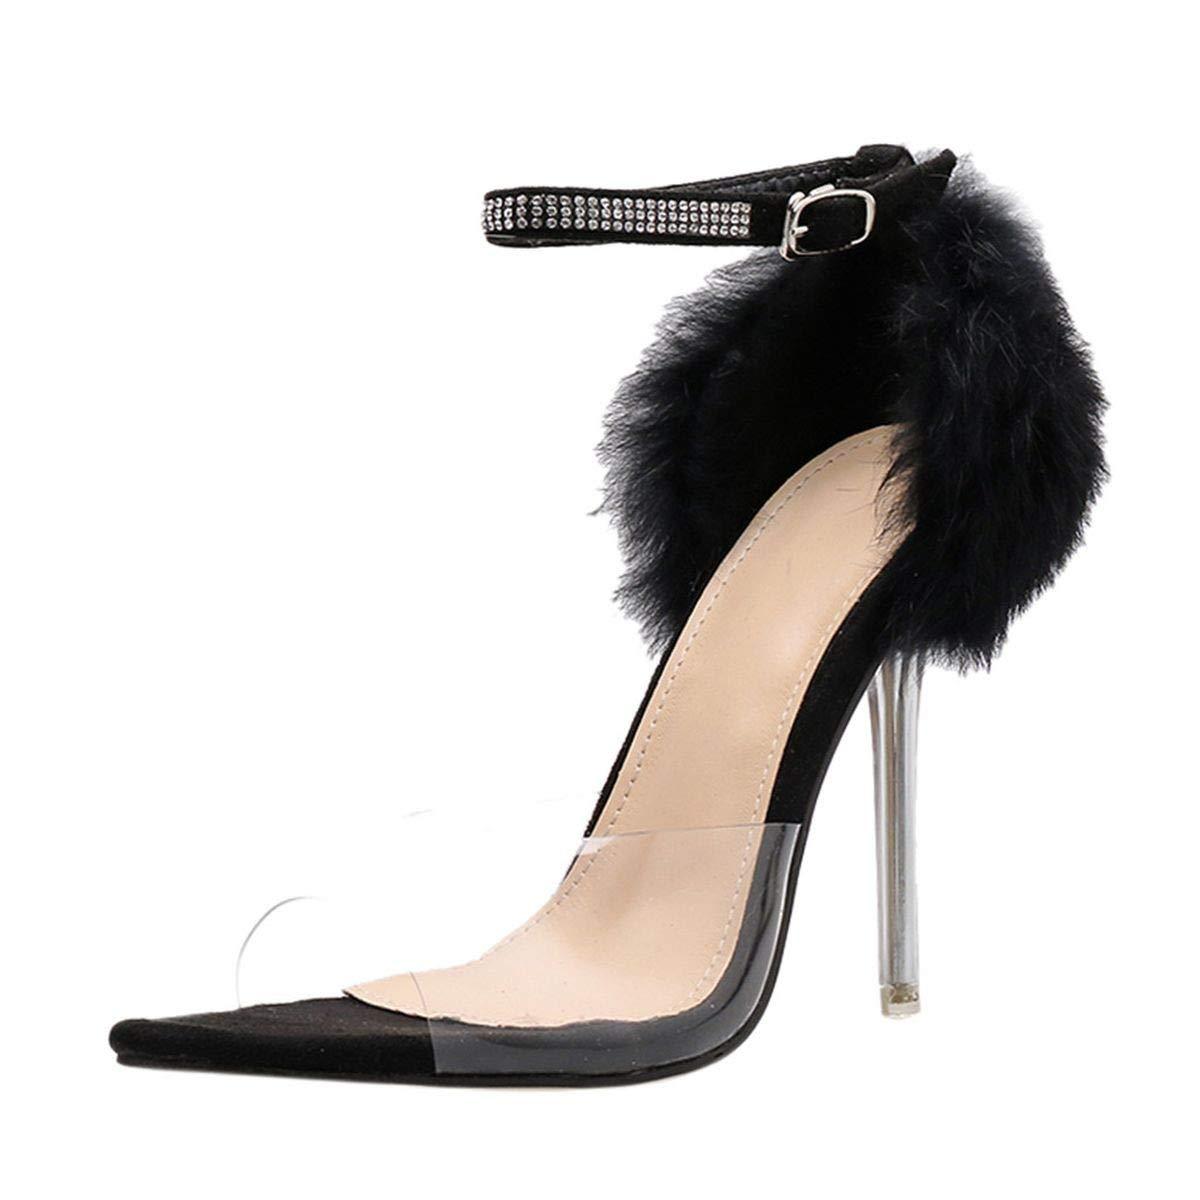 Meiliwanju Women's Clear Open Toe Ankle Strap Feather Furry D'Orsay Stiletto High Heel Dress Sandal Lady Heeled Pumps Shoes (Black, 7.5)